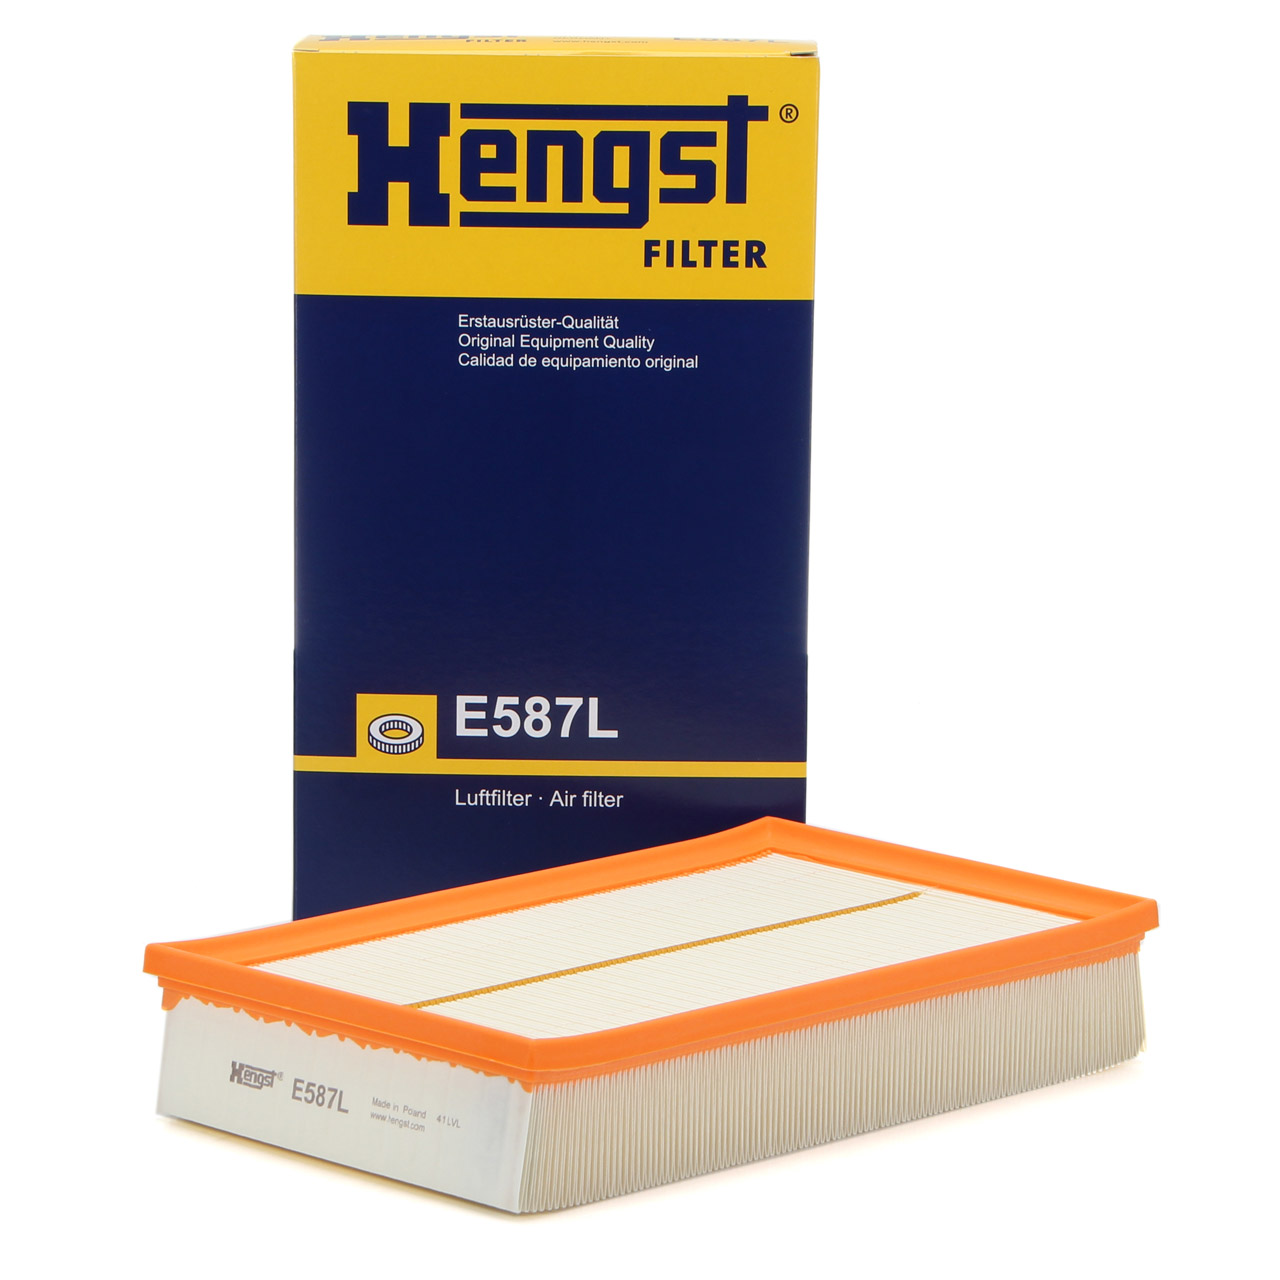 HENGST E587L Luftfilter Motorluft für VW MULTIVAN TRANSPORTER T5 T6 7H0129620